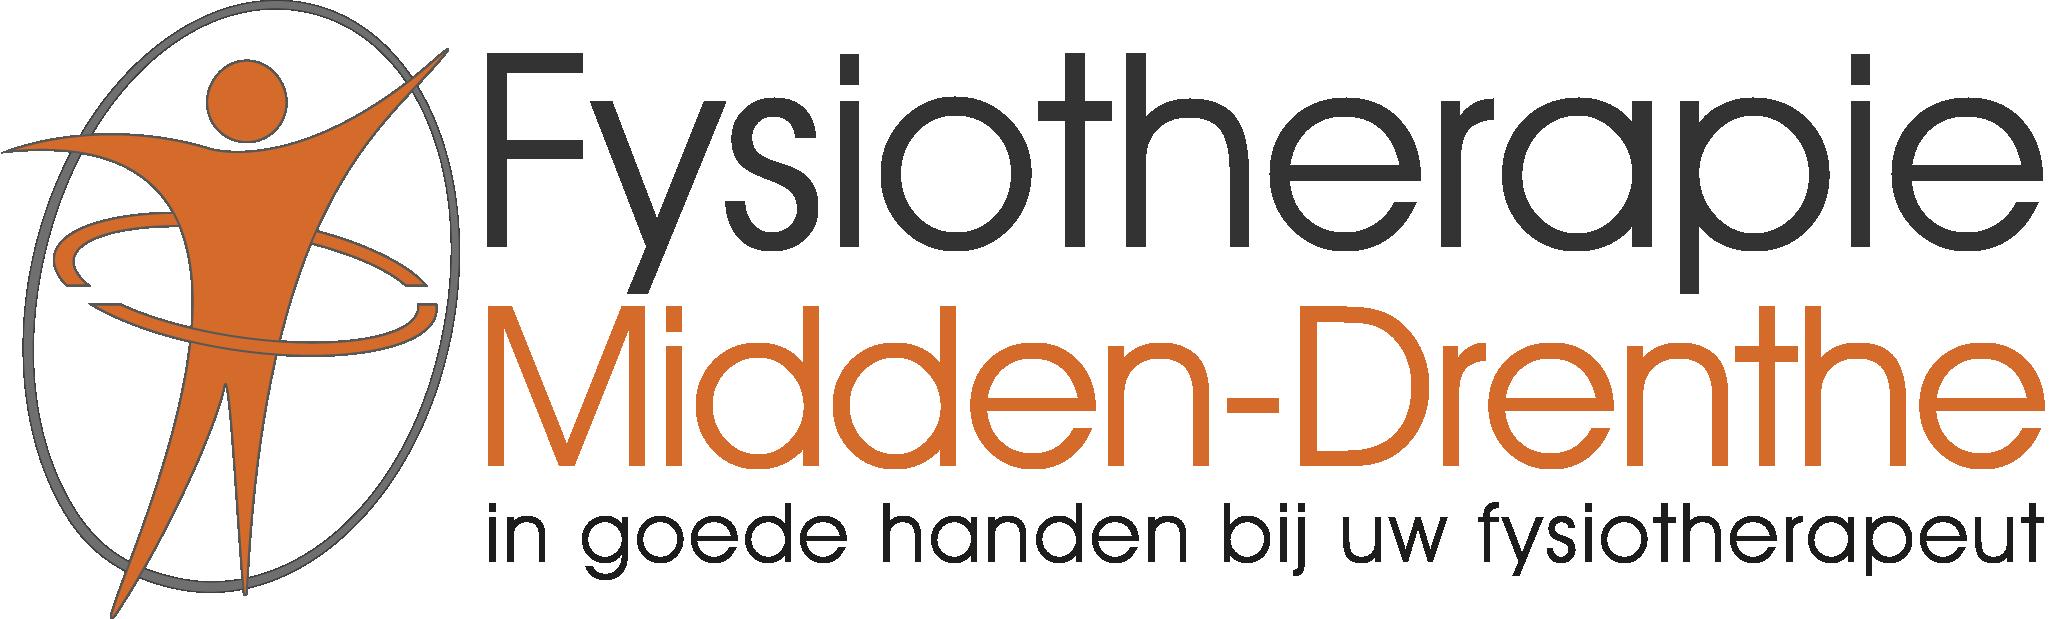 Fysiotherapie Midden-Drenthe